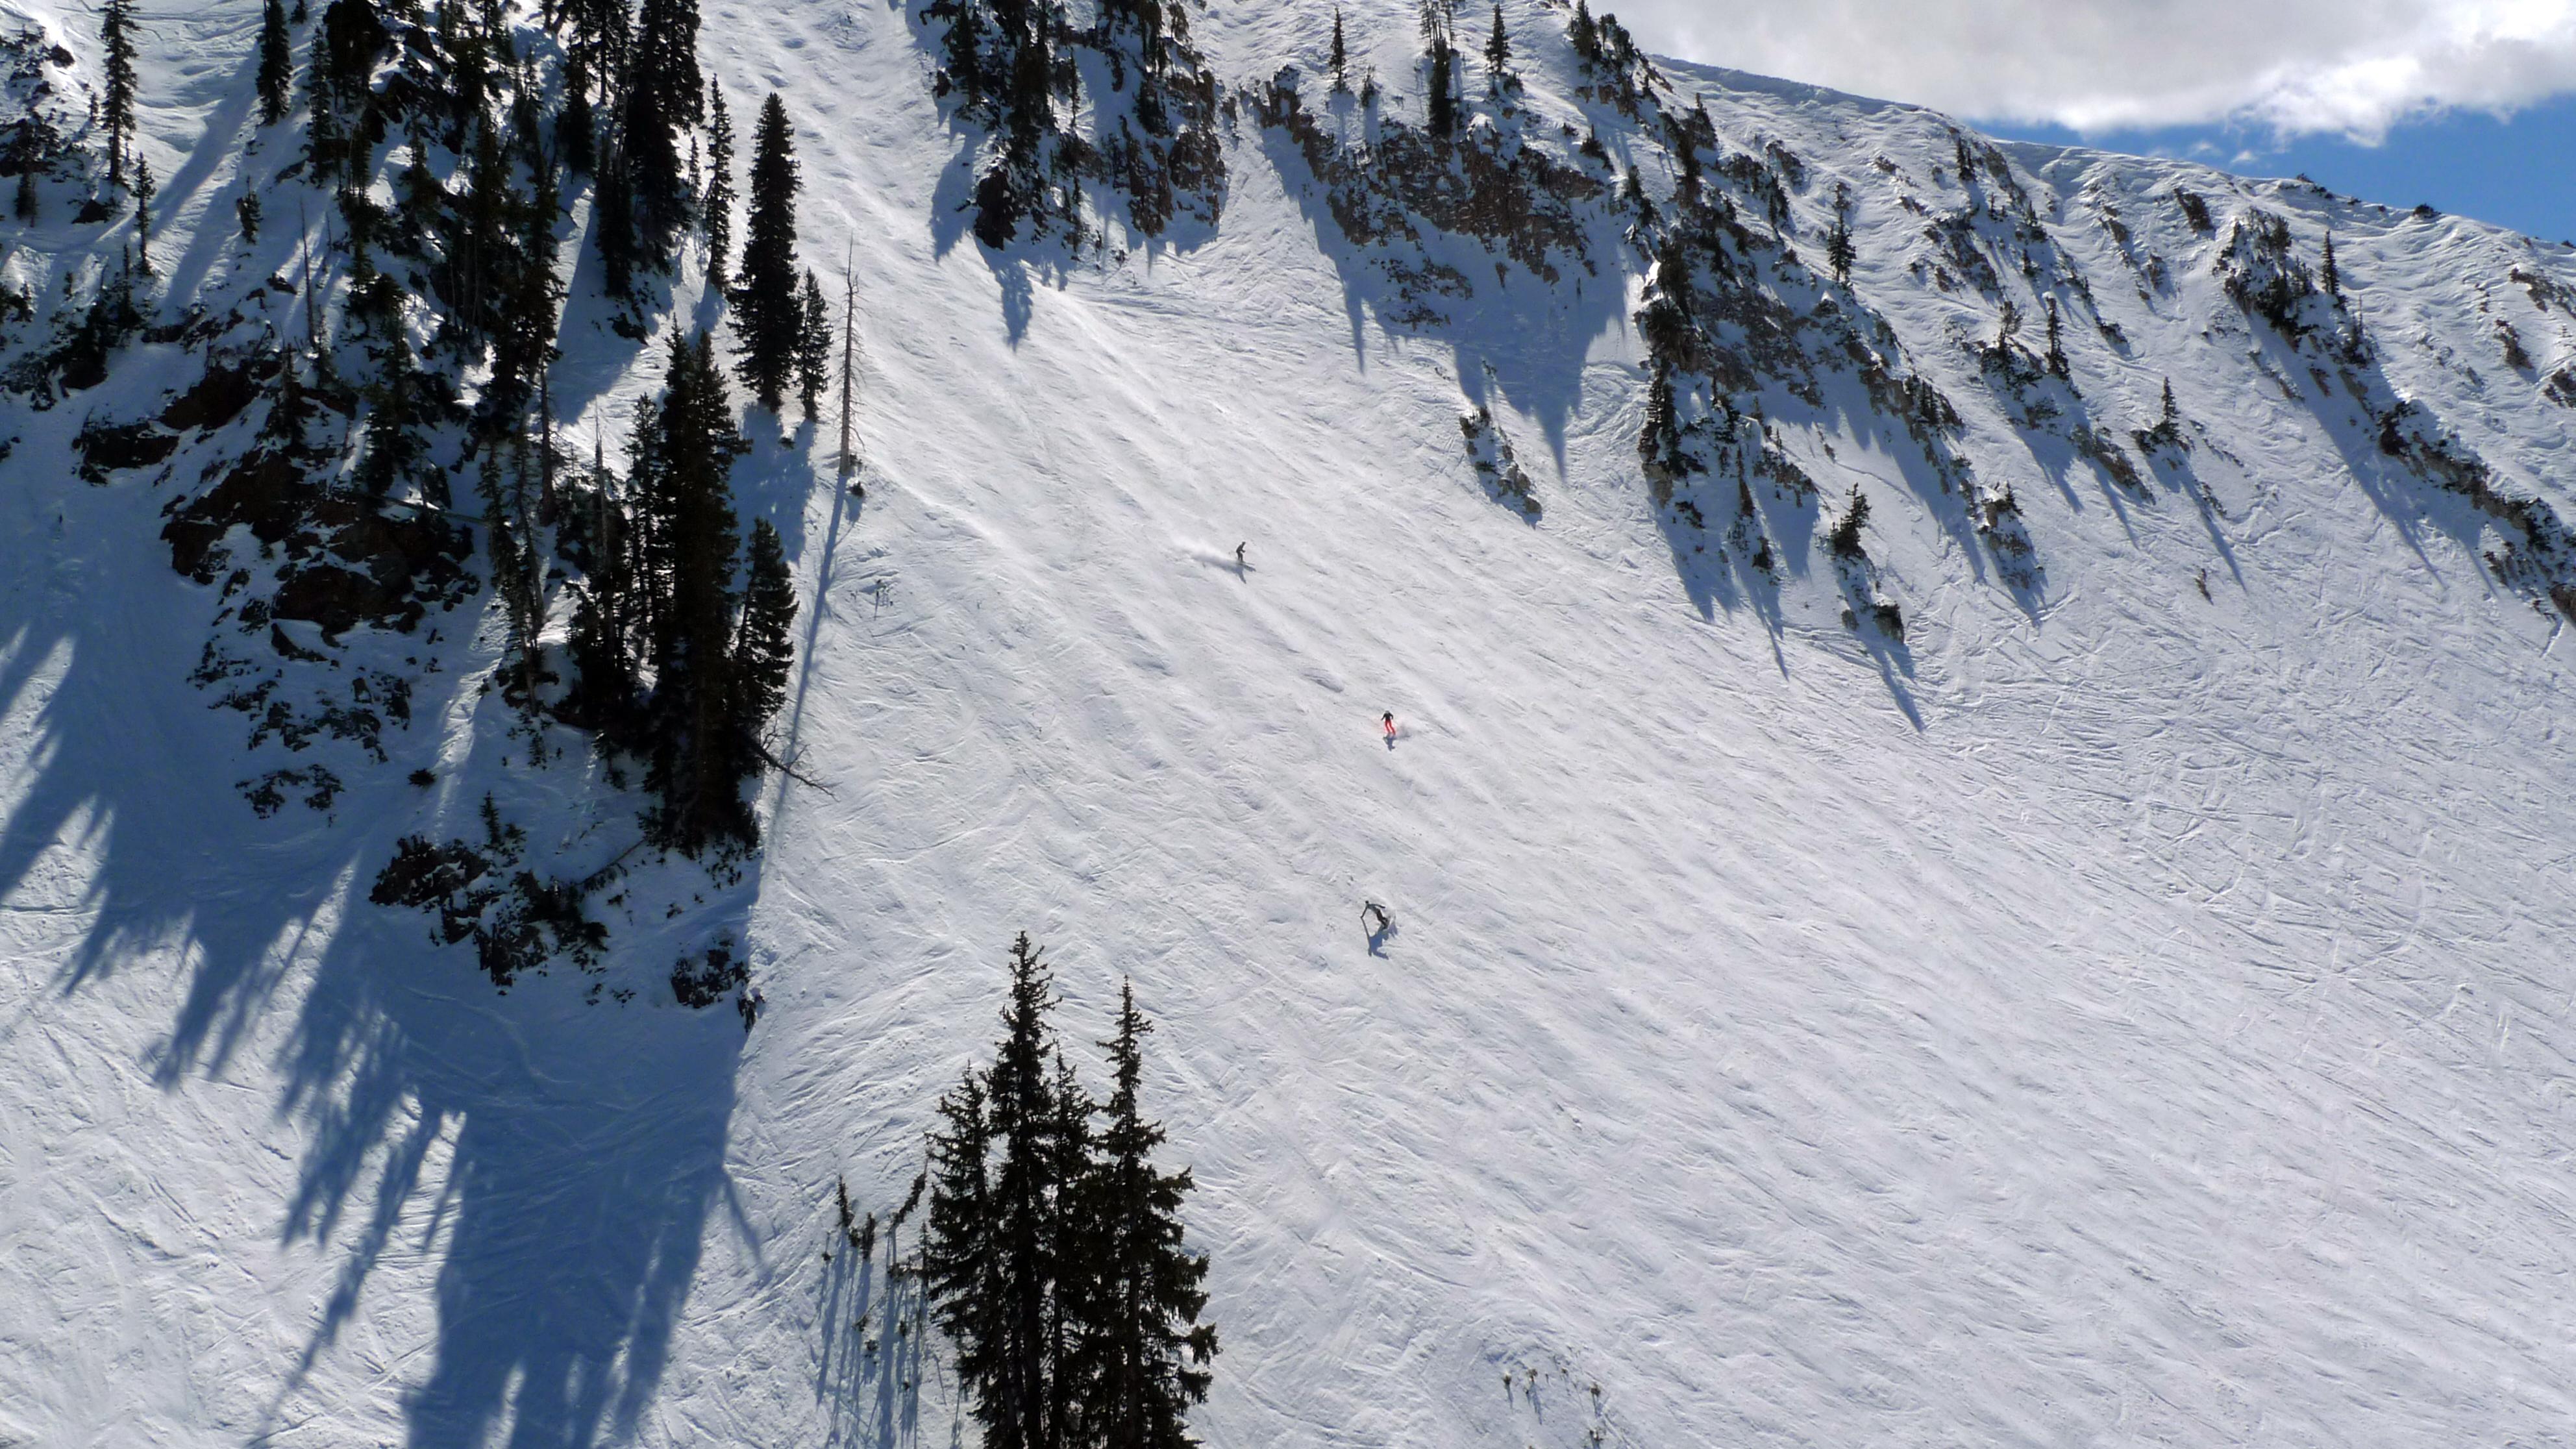 file:skiing at snowbird utah photo ramey logan - wikimedia commons